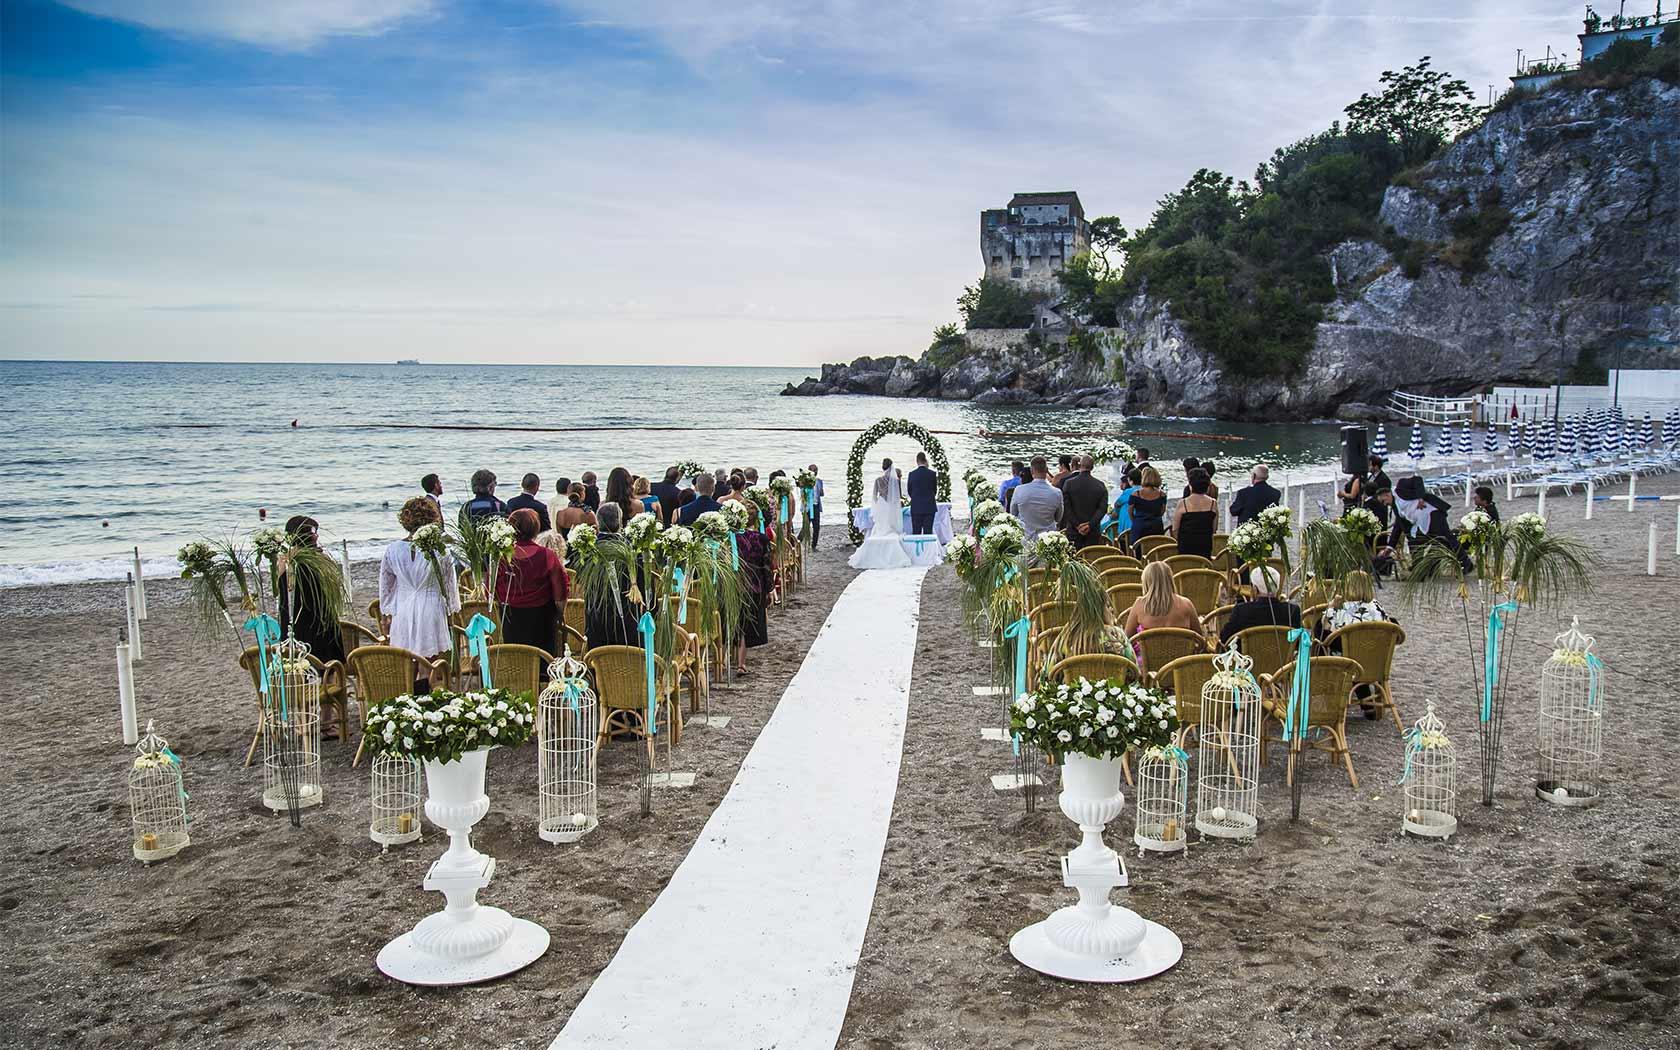 Matrimonio Spiaggia Varigotti : Matrimoni costiera amalfitana cerimonia di nozze sul mare